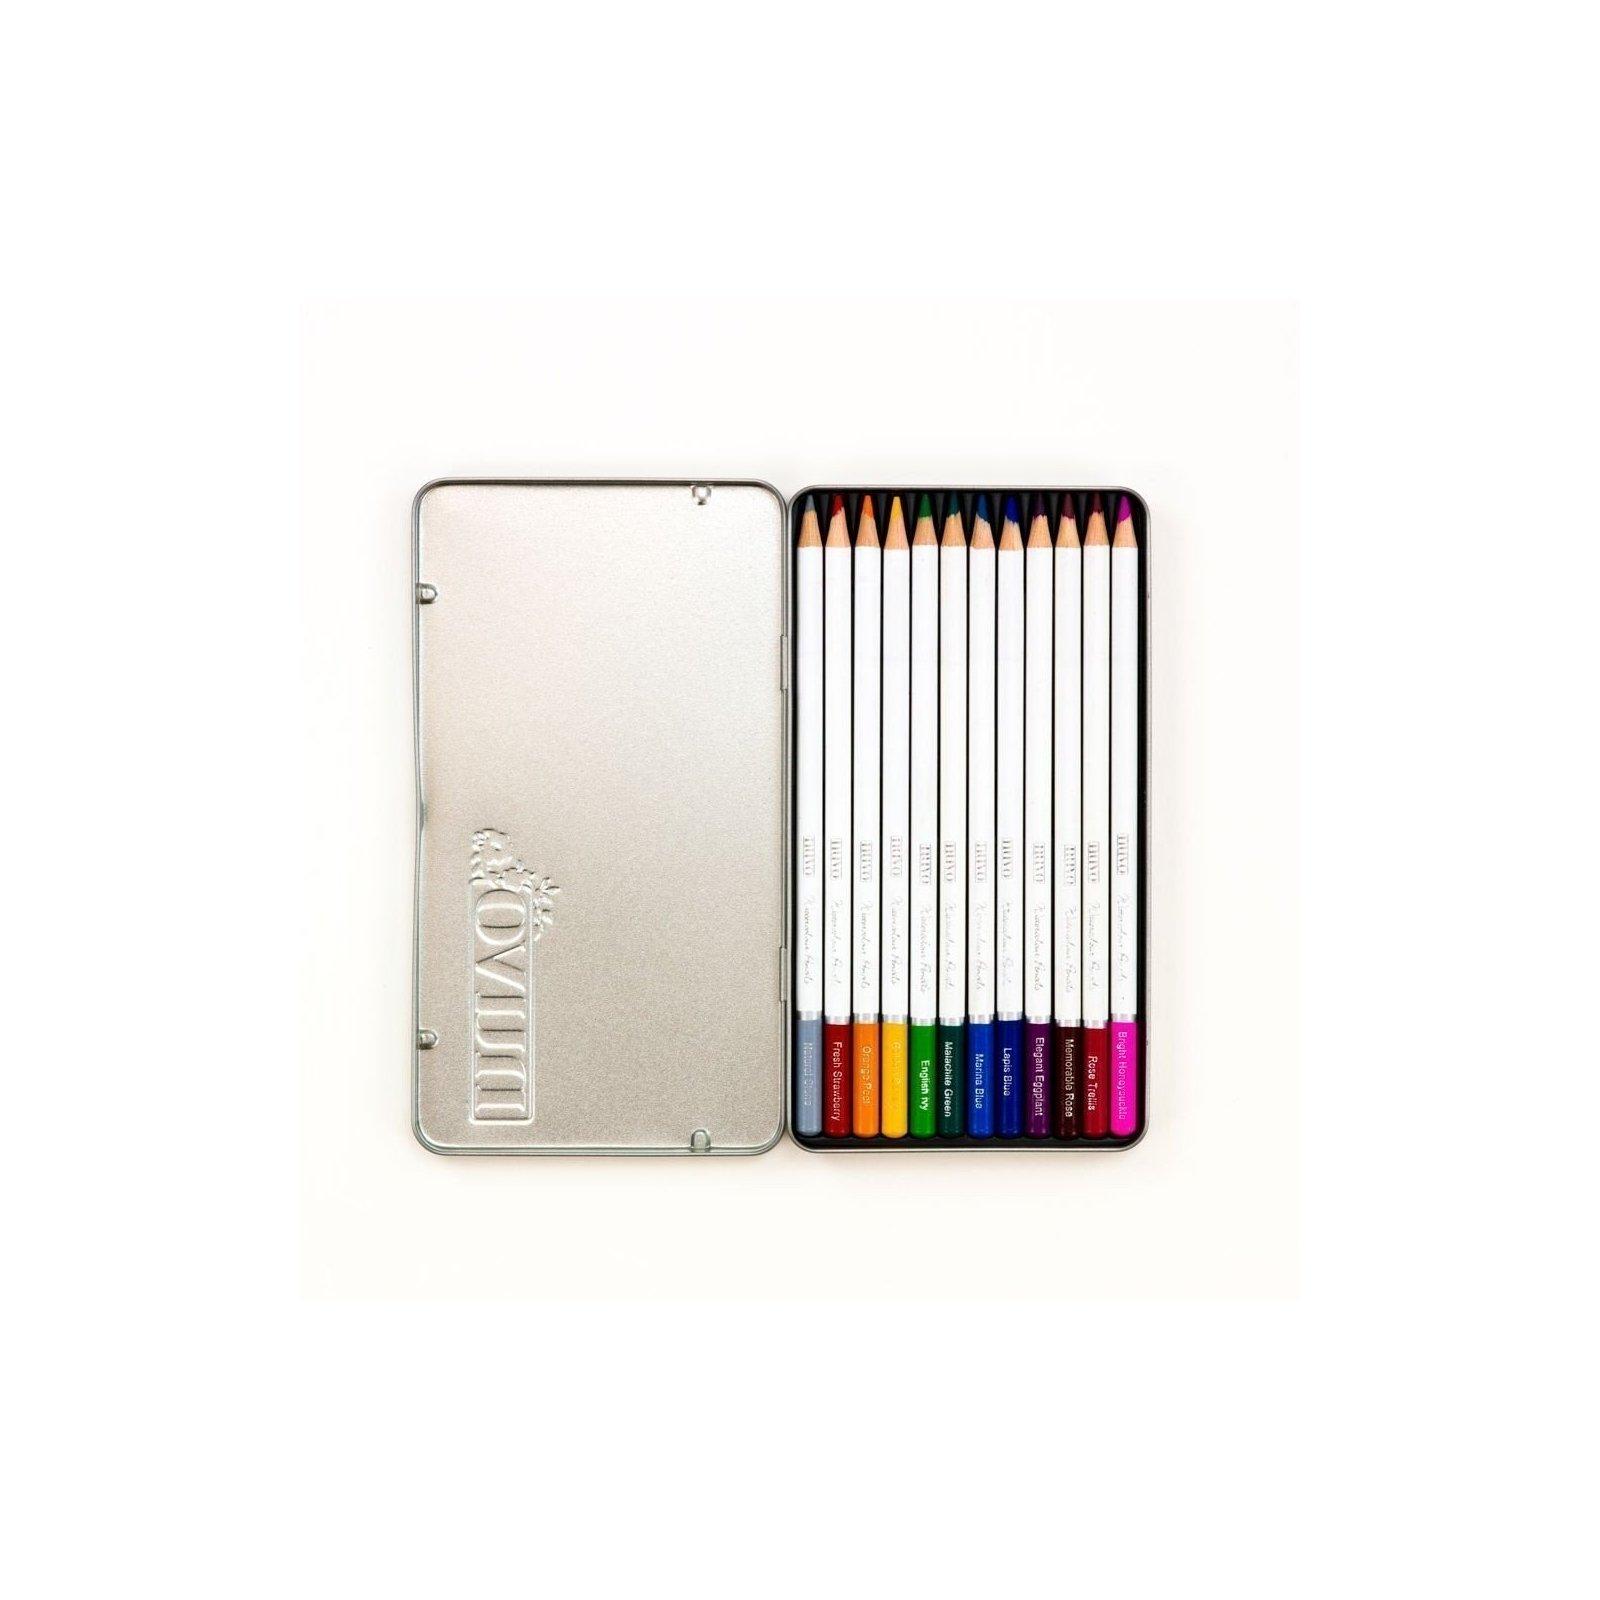 Palette de 12 crayons aquarellables - Elementary Midtones - Tonic Studio